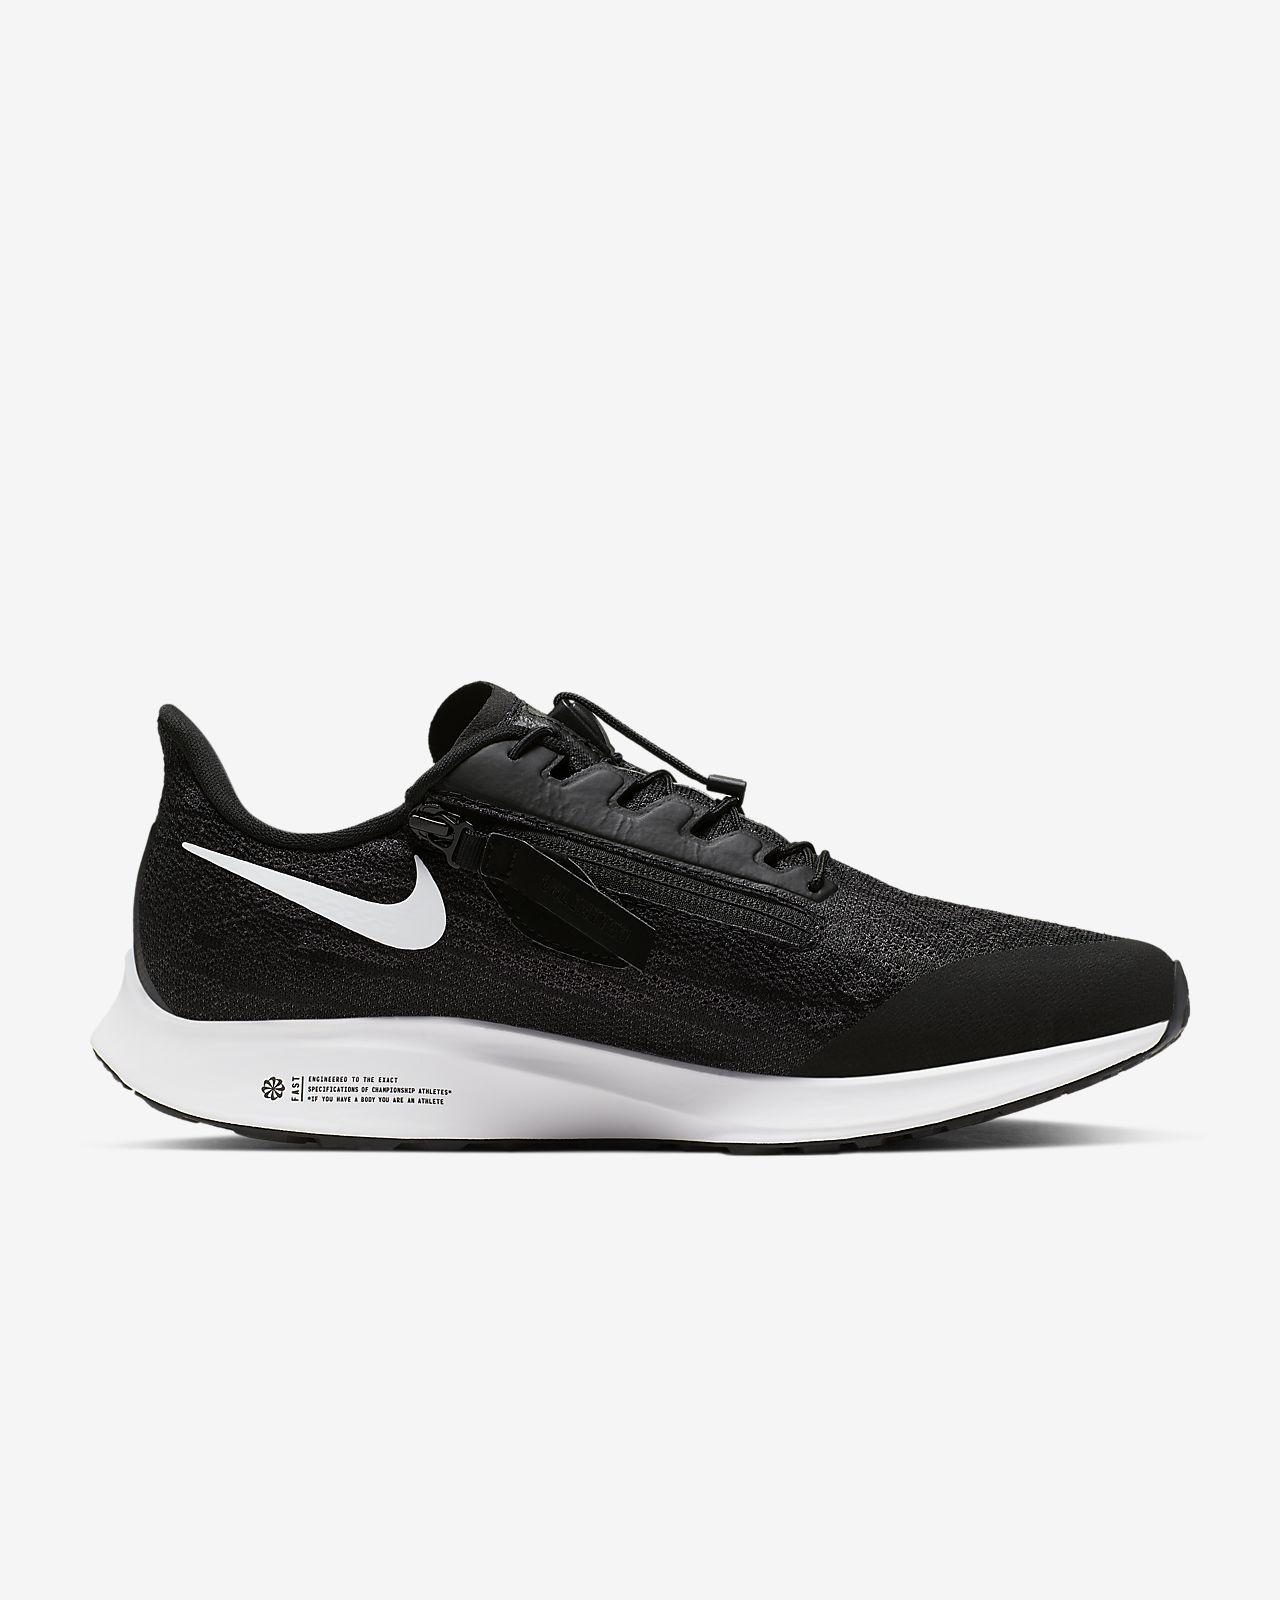 Nike Air Max 1 Masculino Tamanho 10 PretoPure Platinum